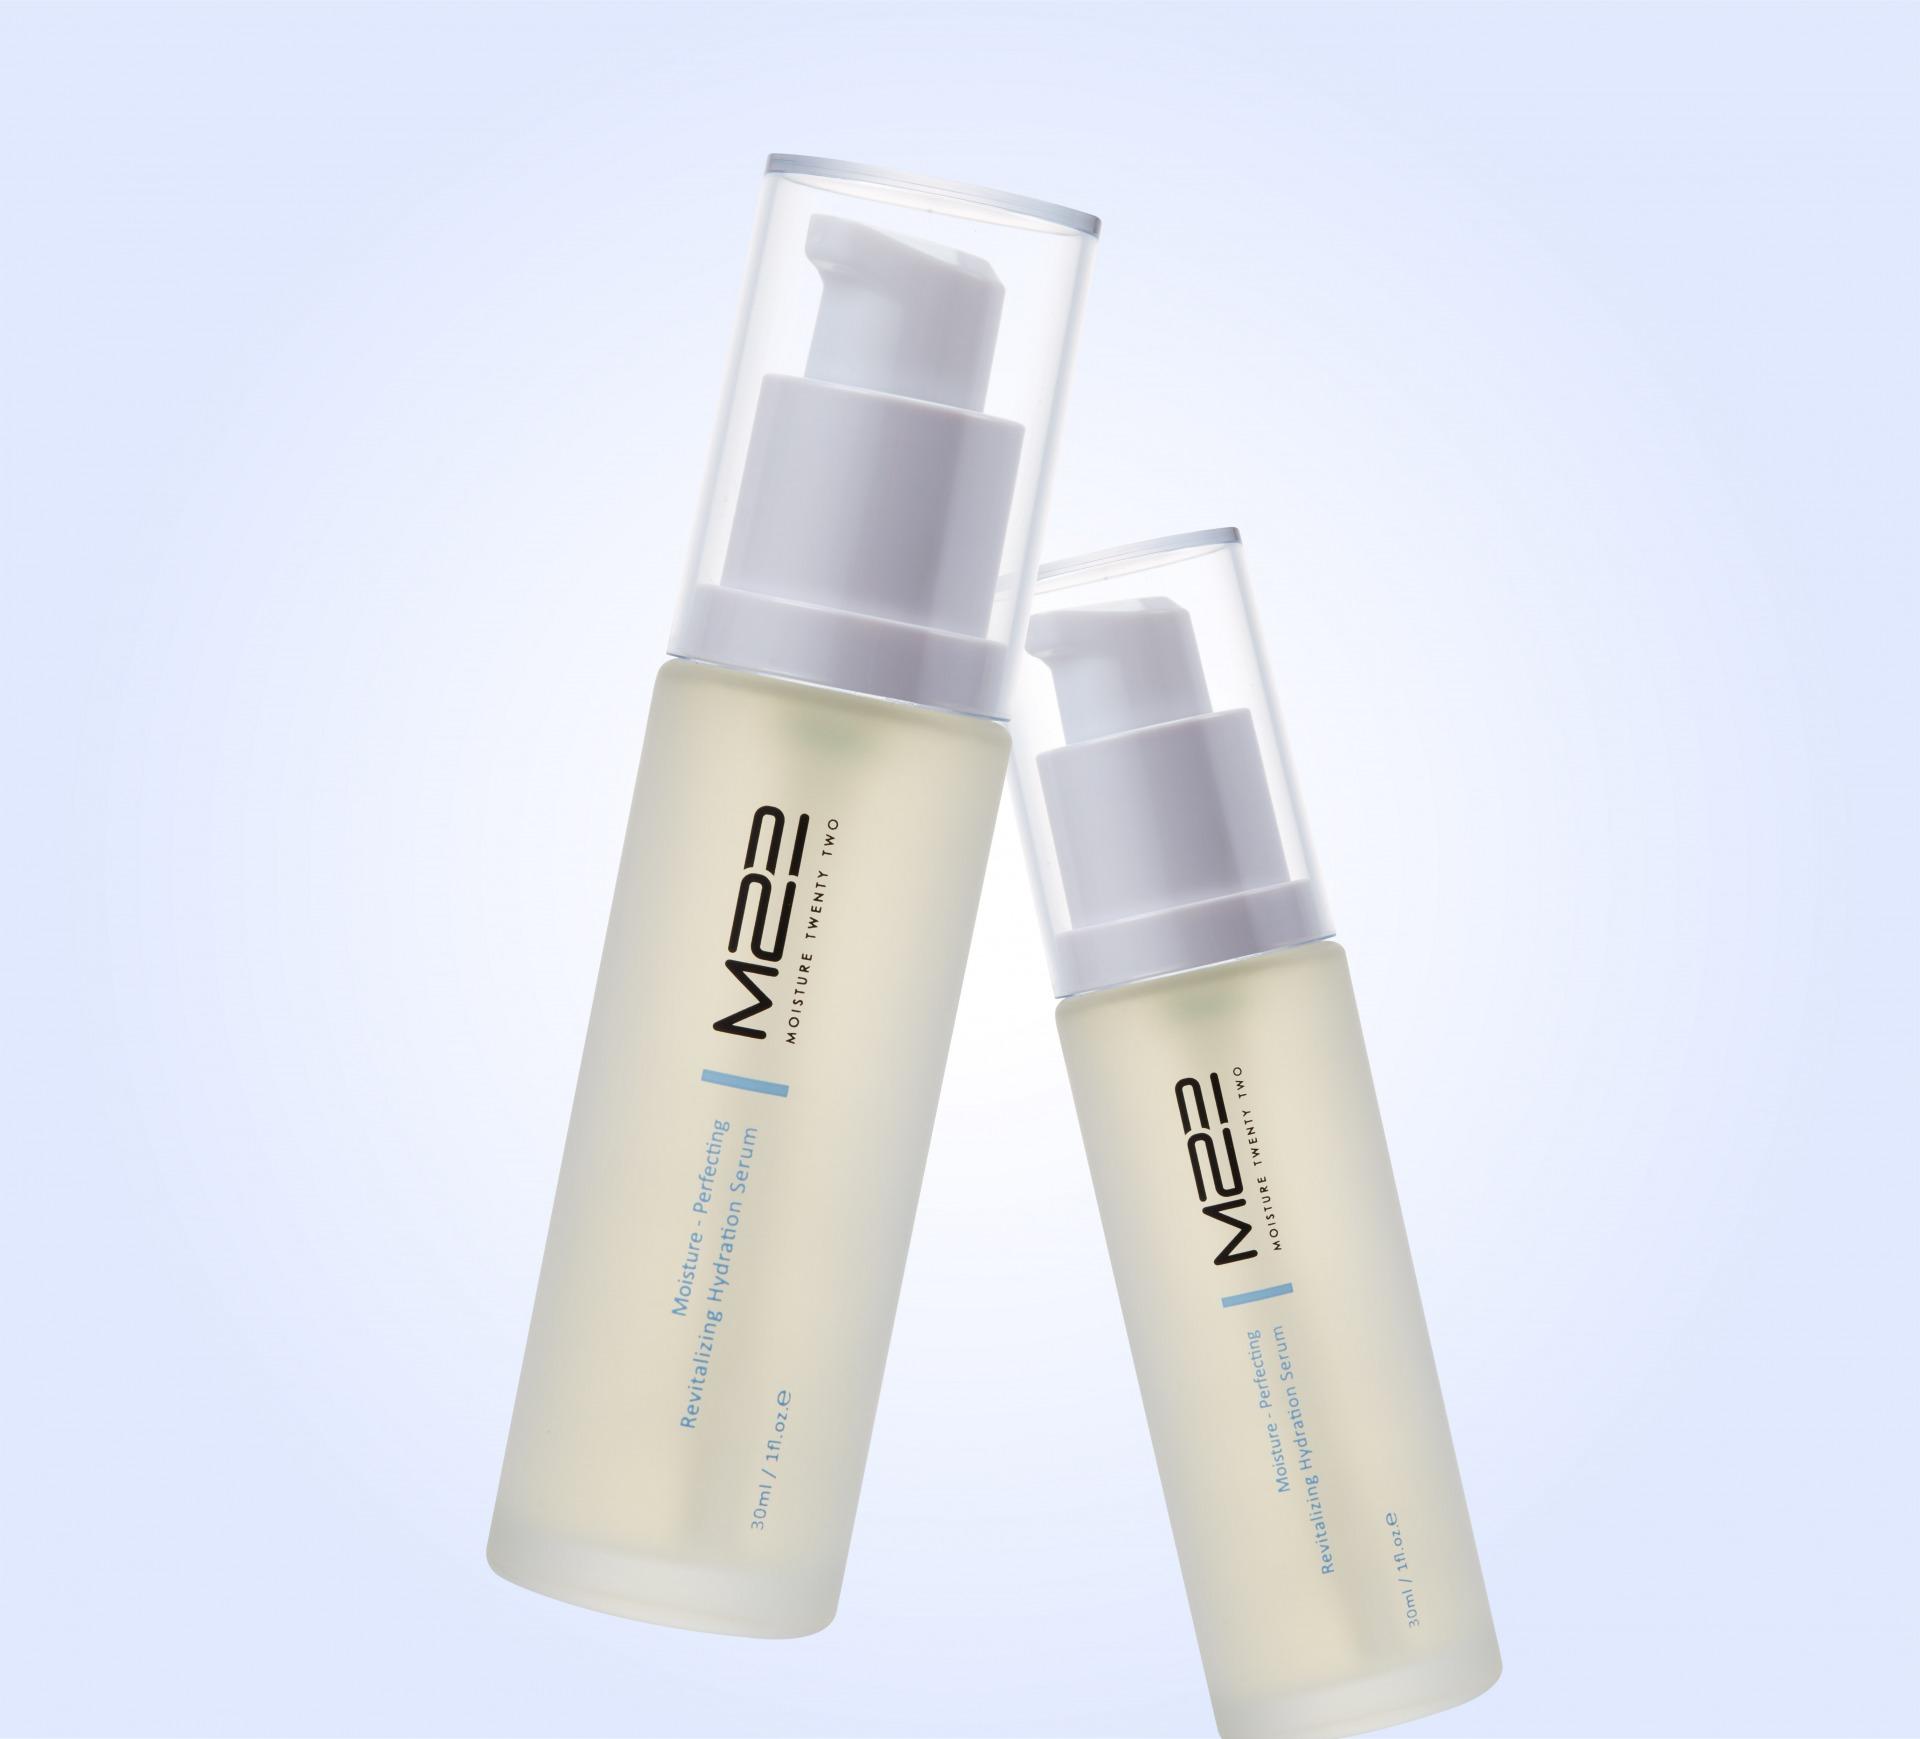 M22_v2_Products清透保濕_清透保濕精華V2_product01